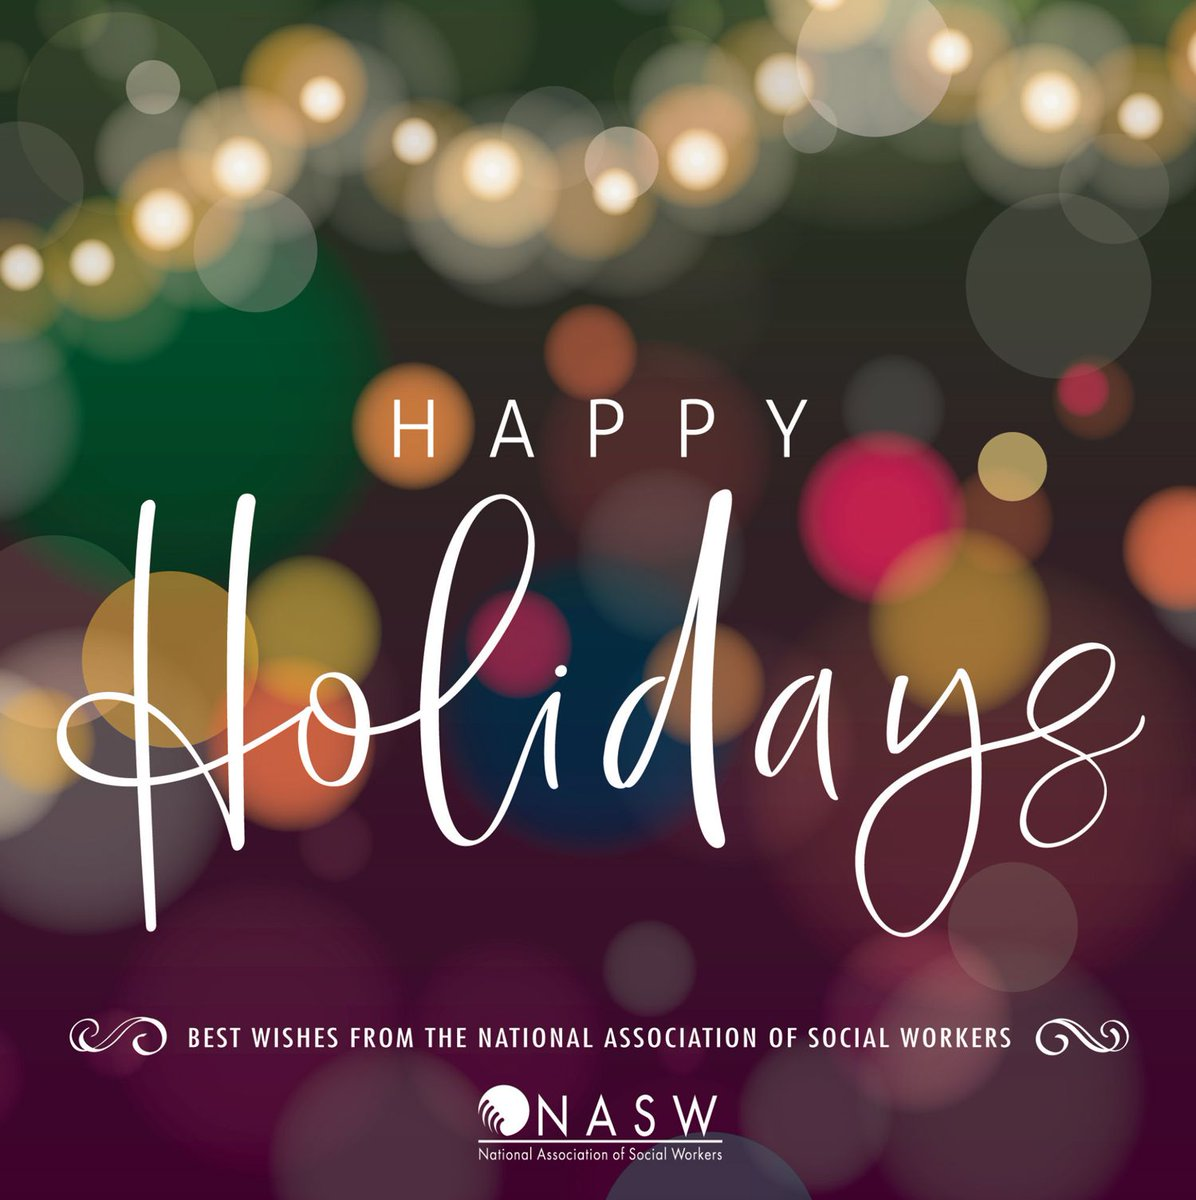 #SeasonsGreetings from #NASW #happyholidays